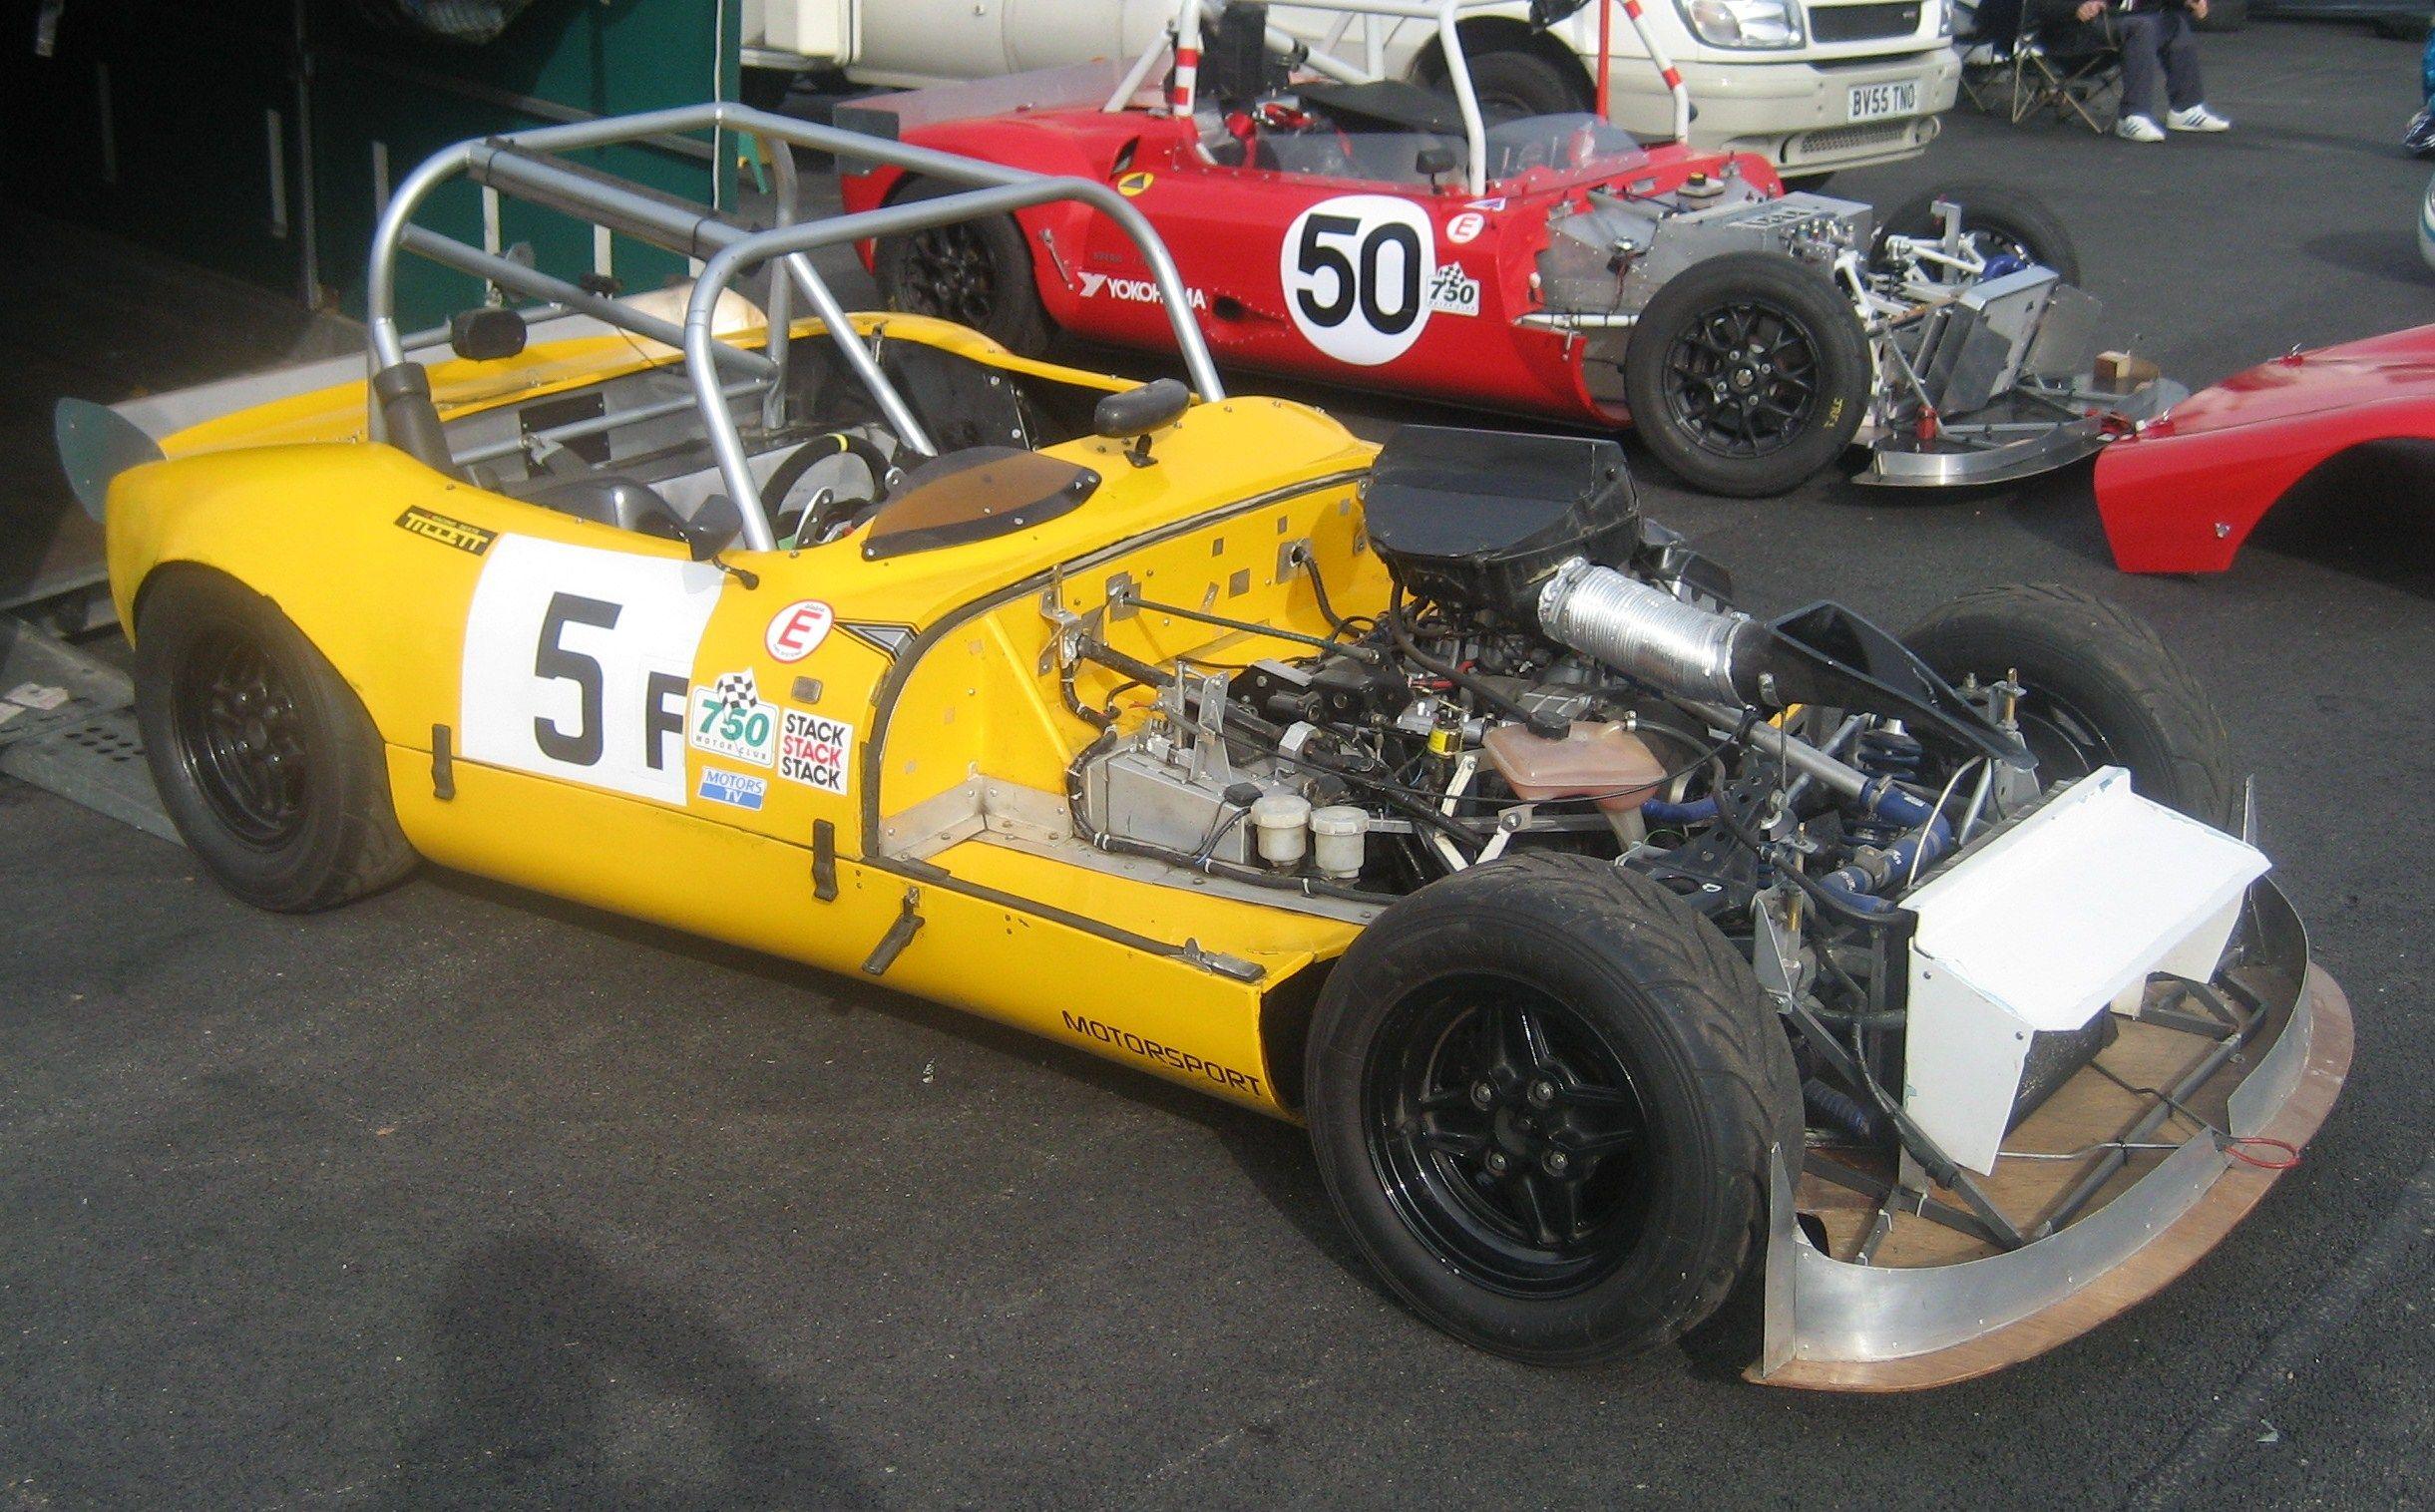 Fisher fury 998cc class f mp kit cars fury clubman